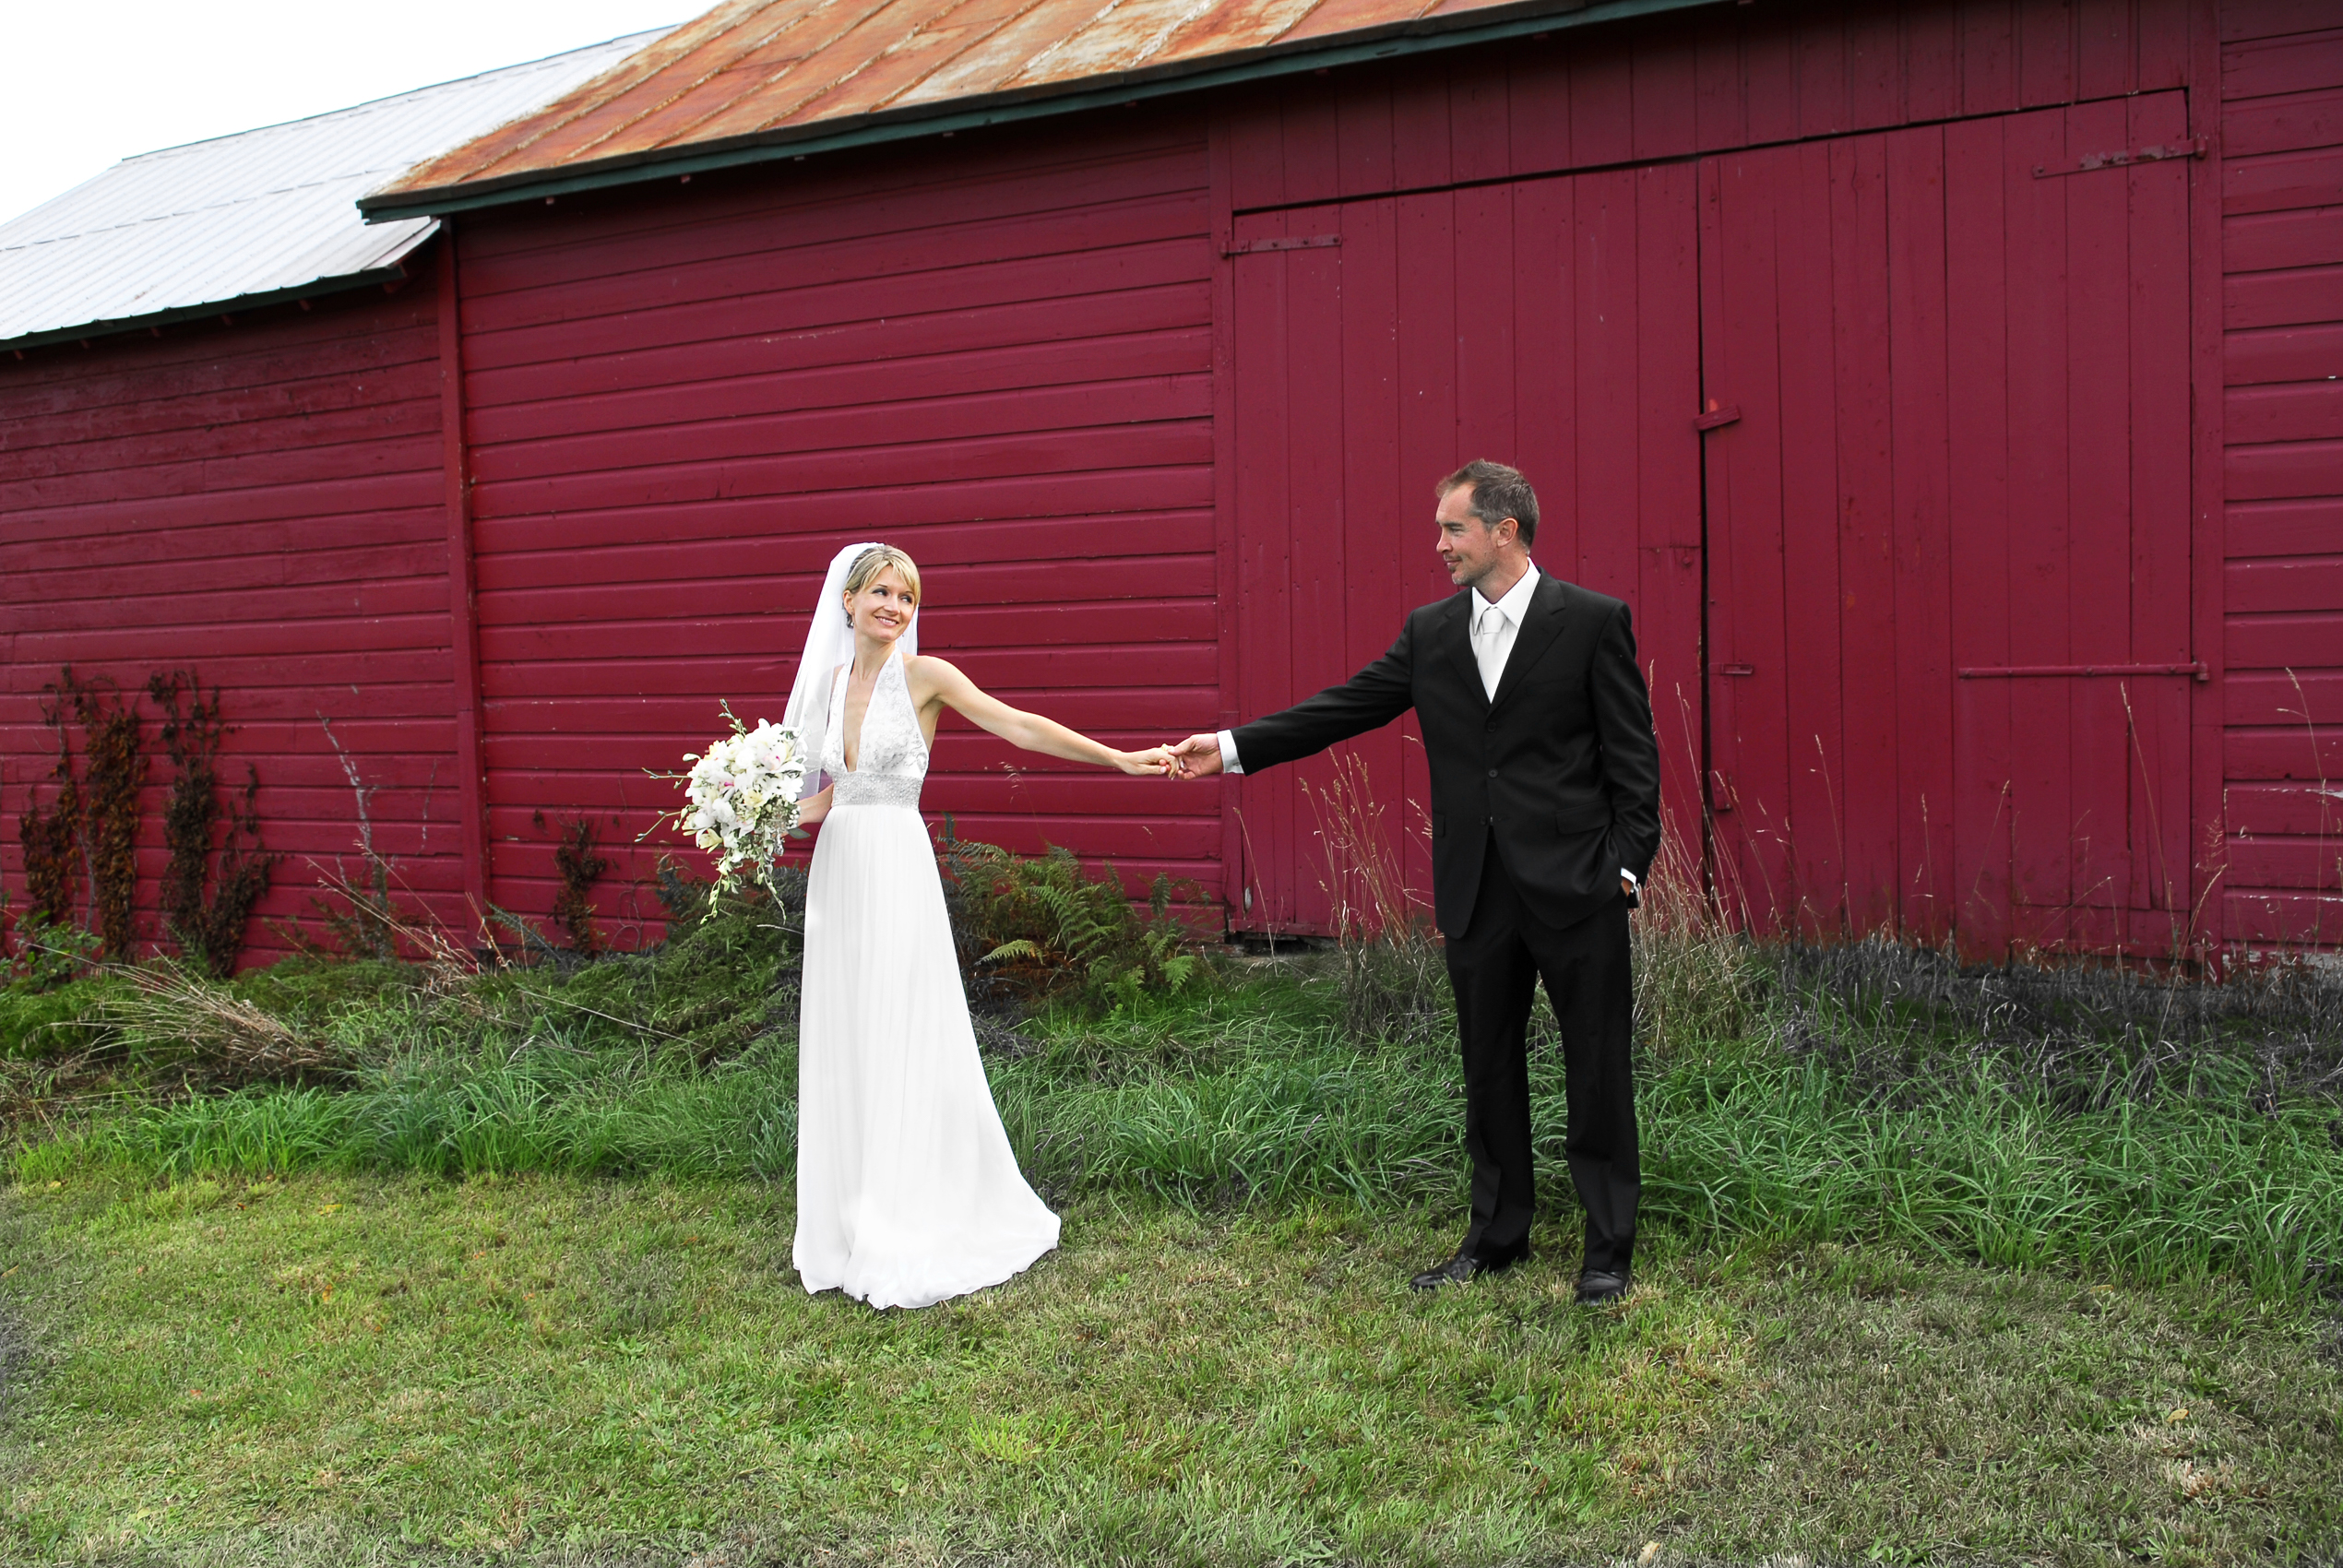 West_Hartford_Connecticut_Wedding_Photography-013.jpg